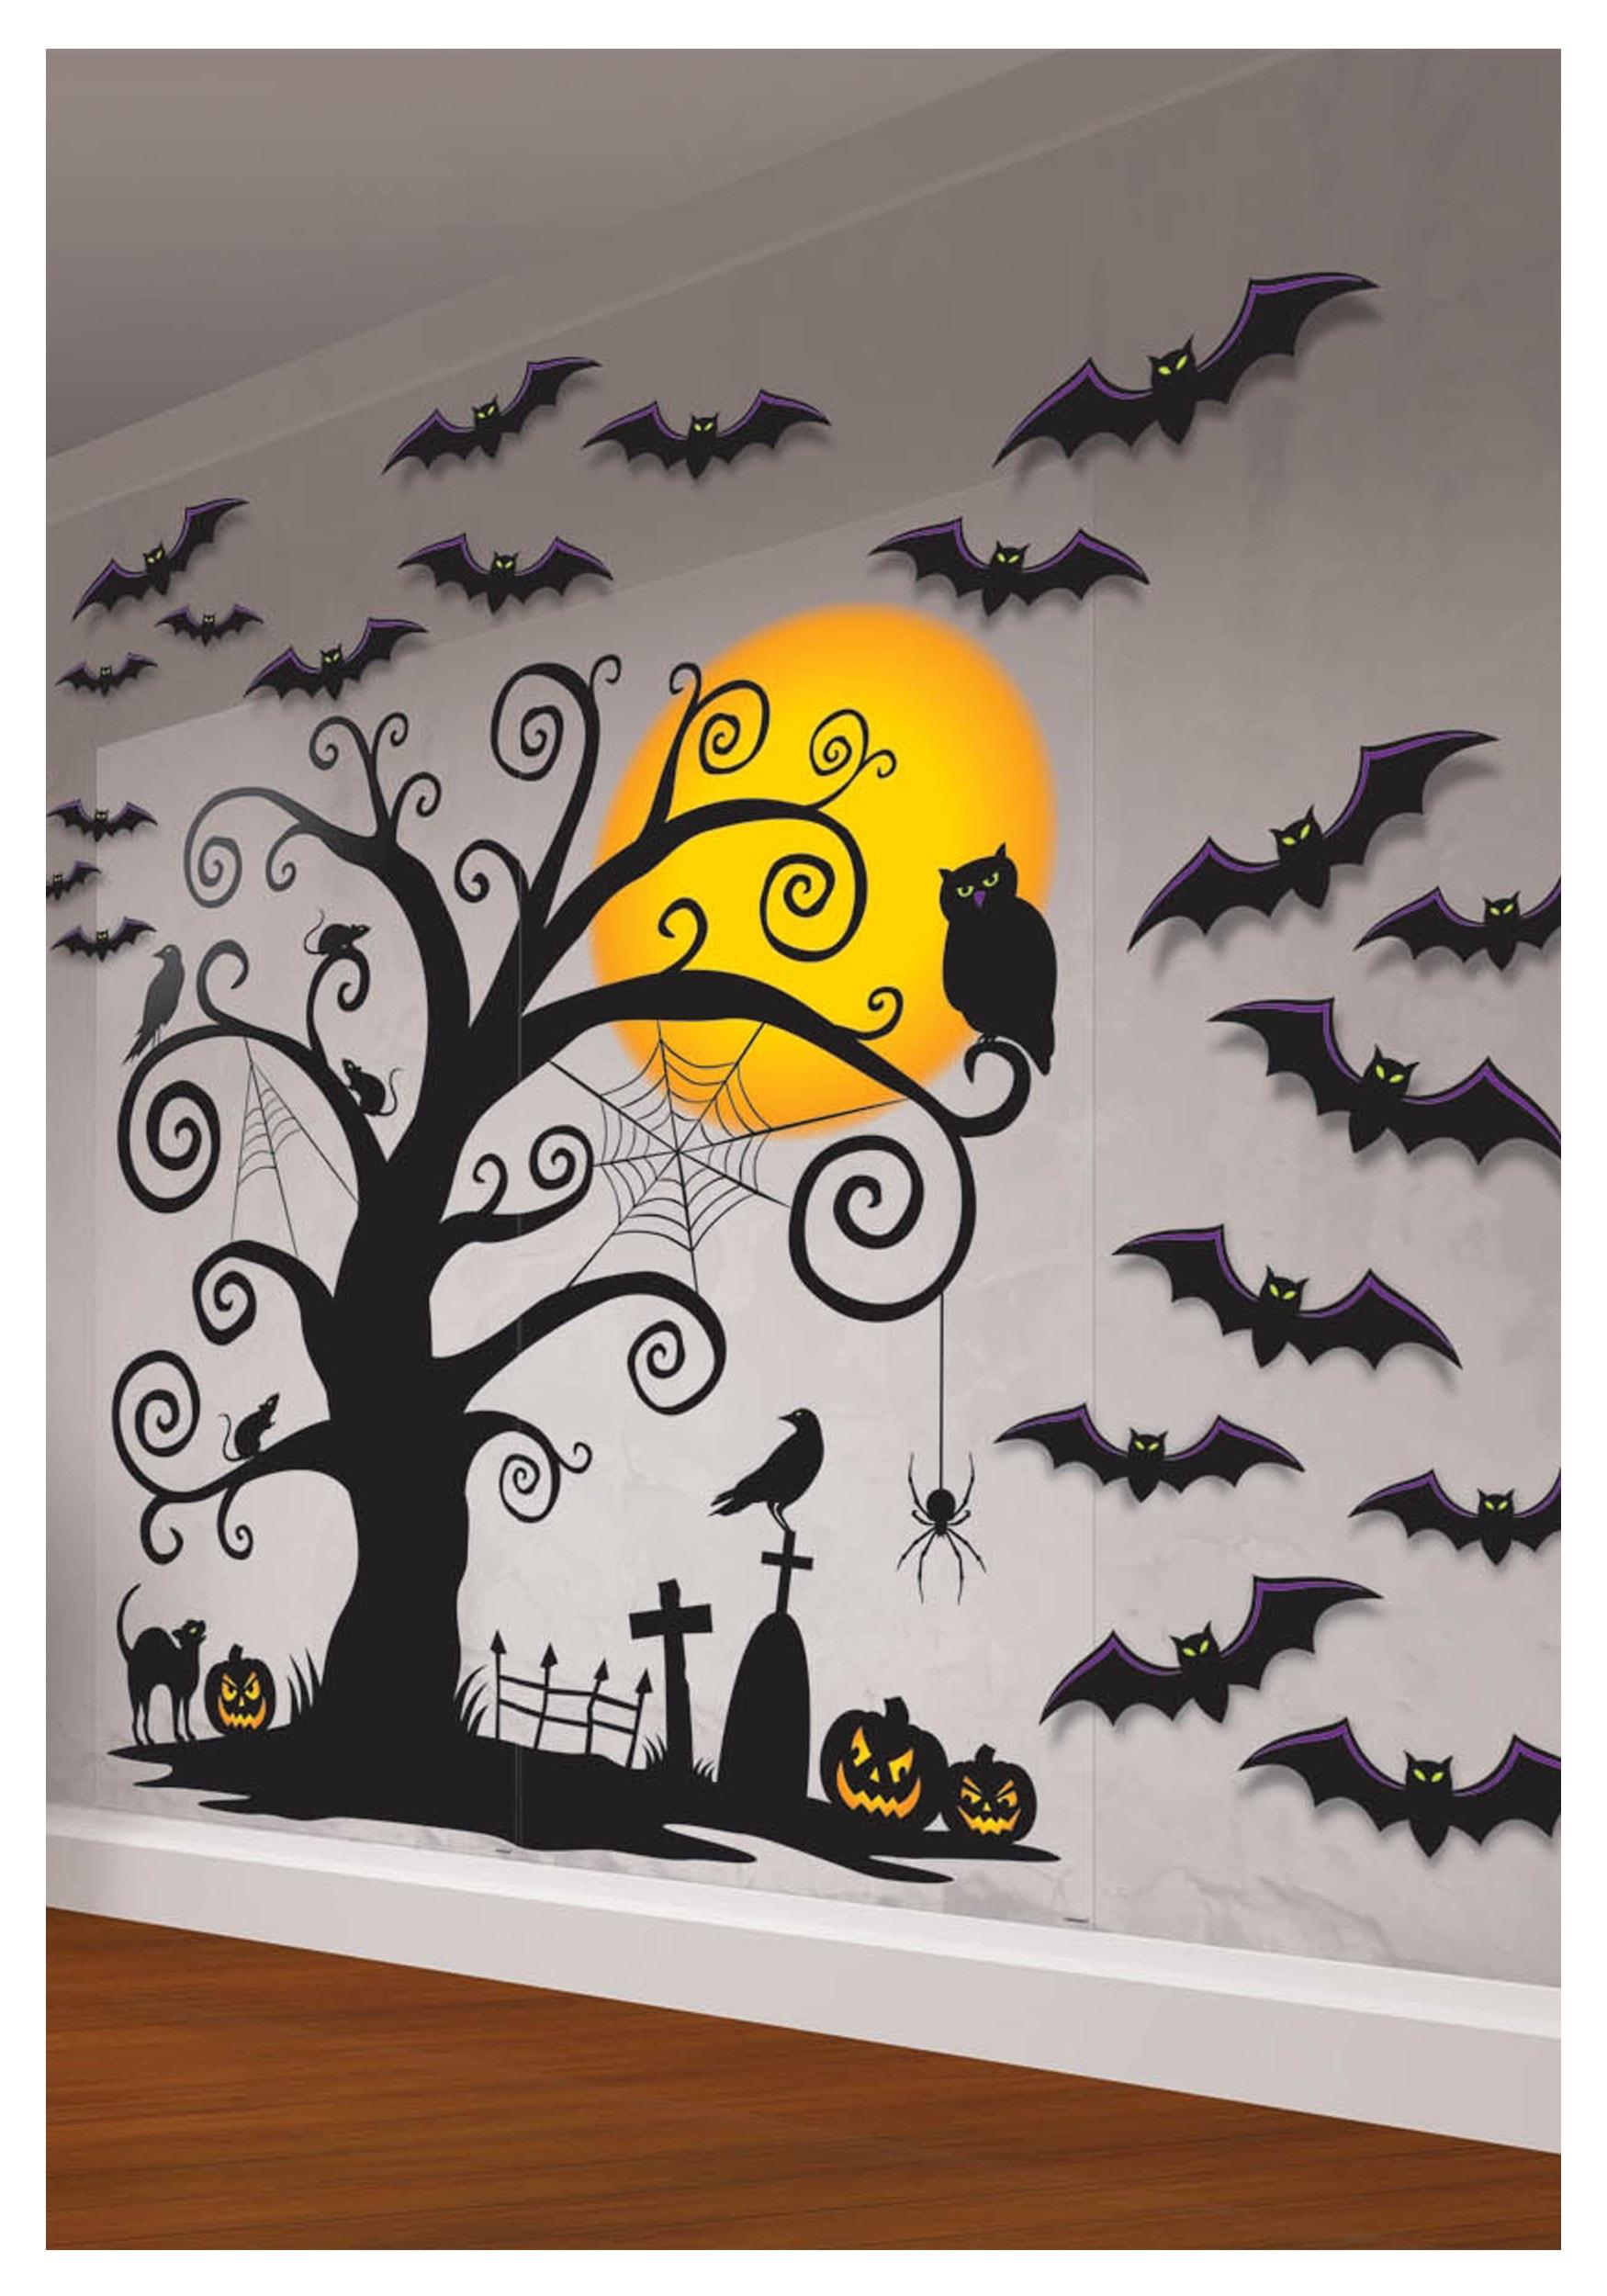 Superb Indoor Wall Decorating Kit